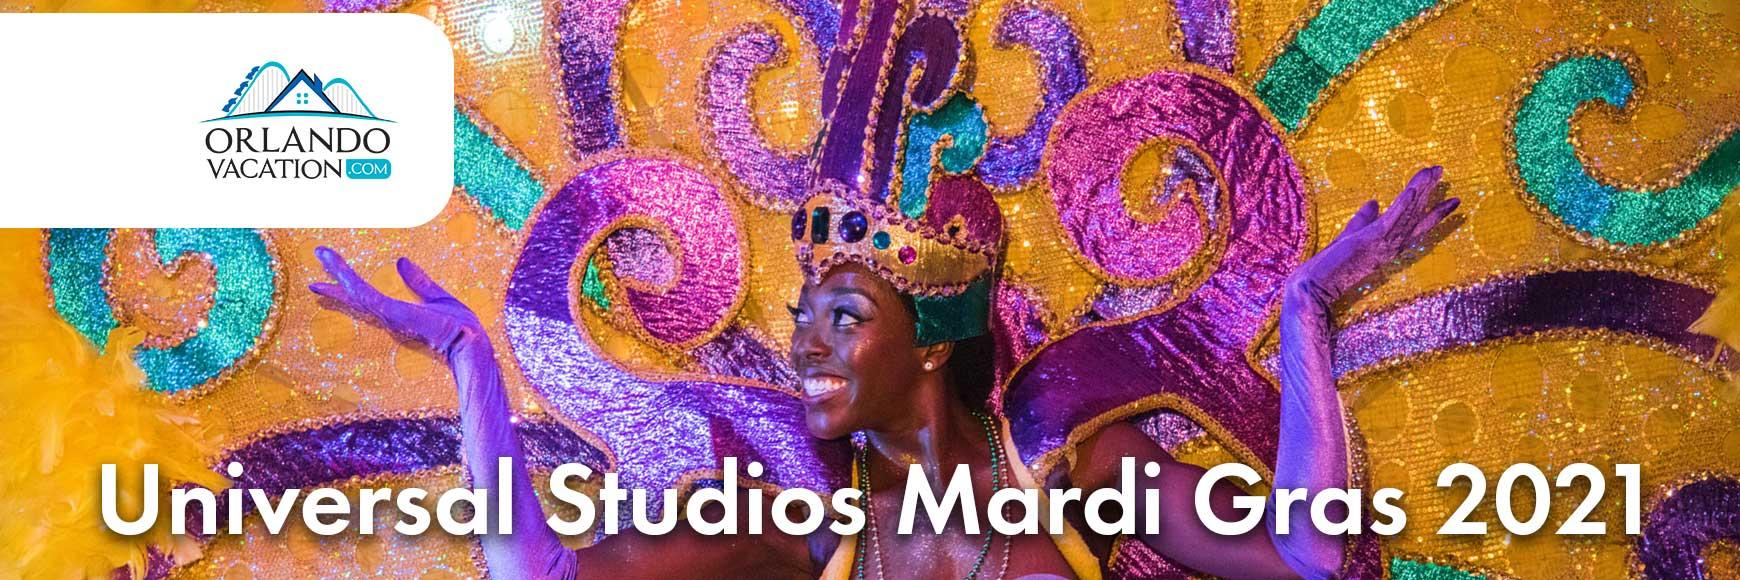 Mardi Gras 2021 at Universal Studios Orlando Florida